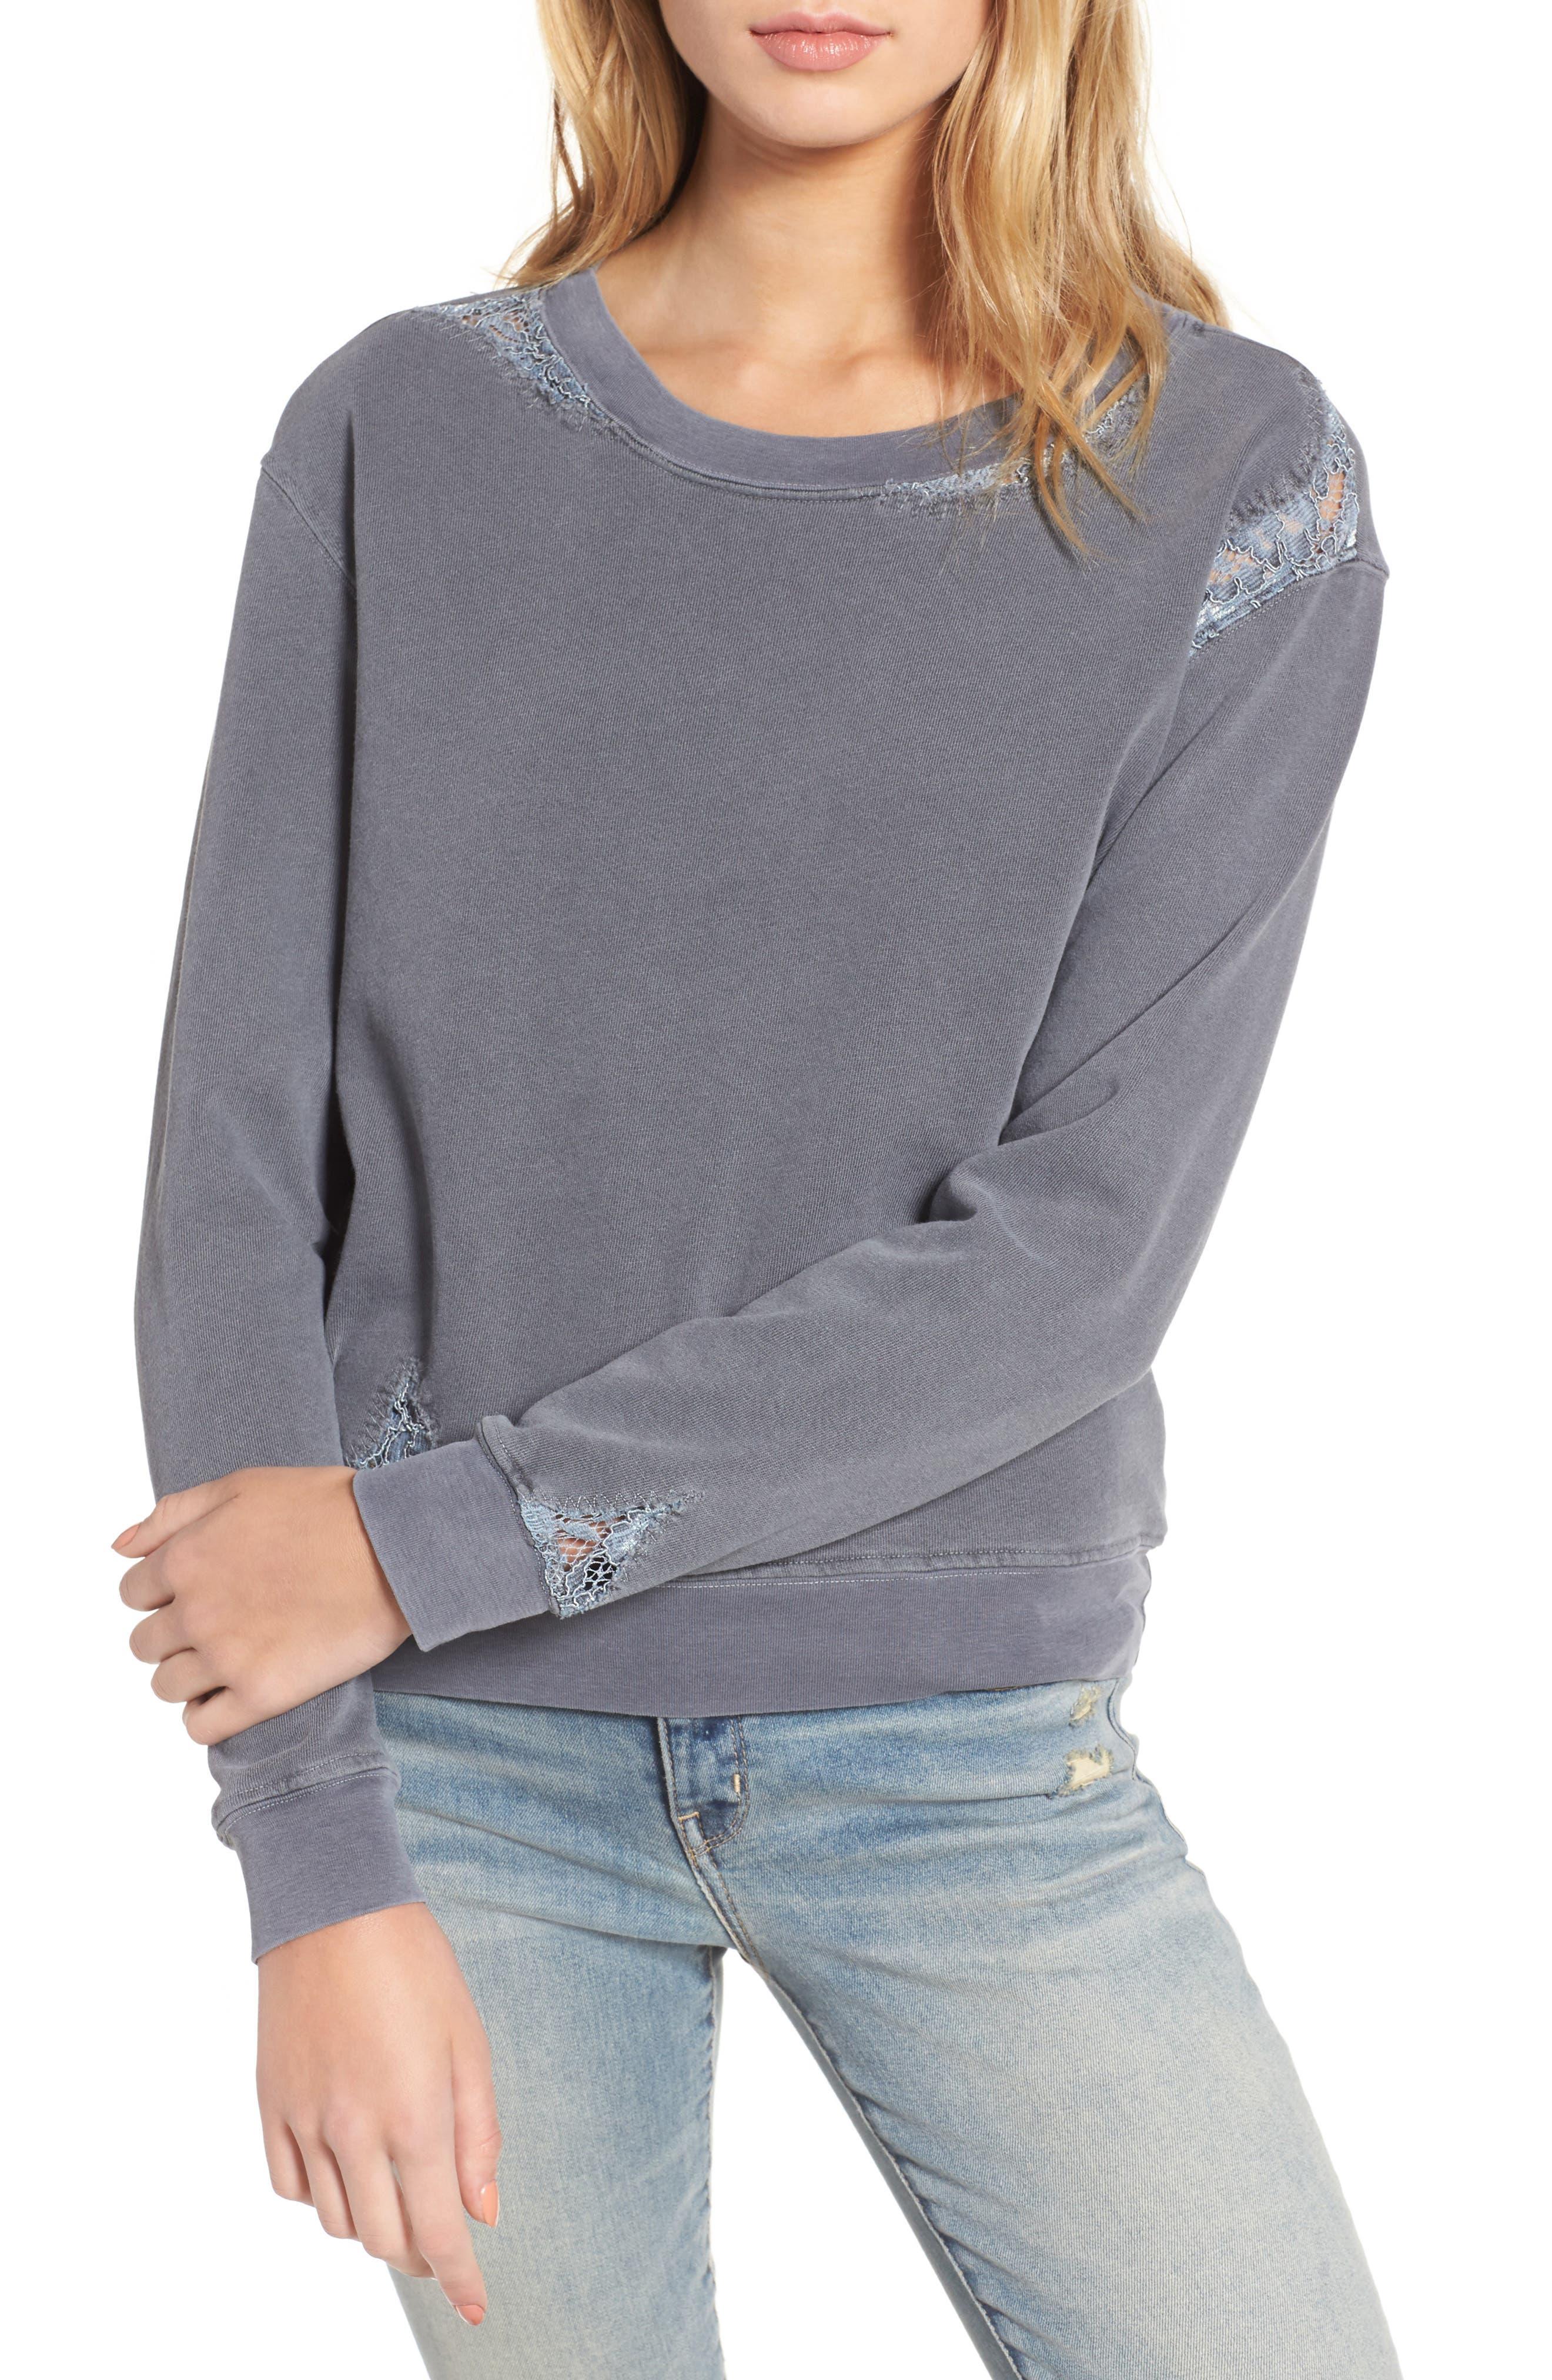 Main Image - Stateside Lace Trim Sweatshirt